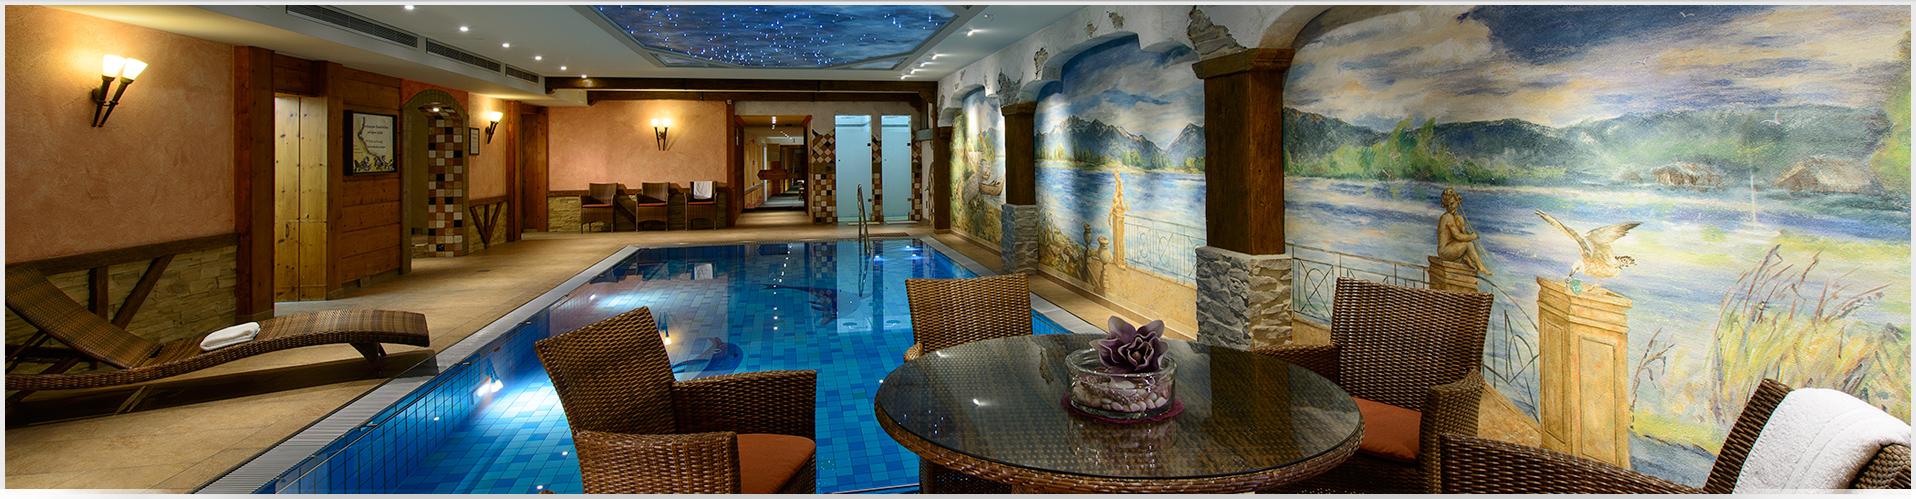 Hotels  Sterne Chiemsee